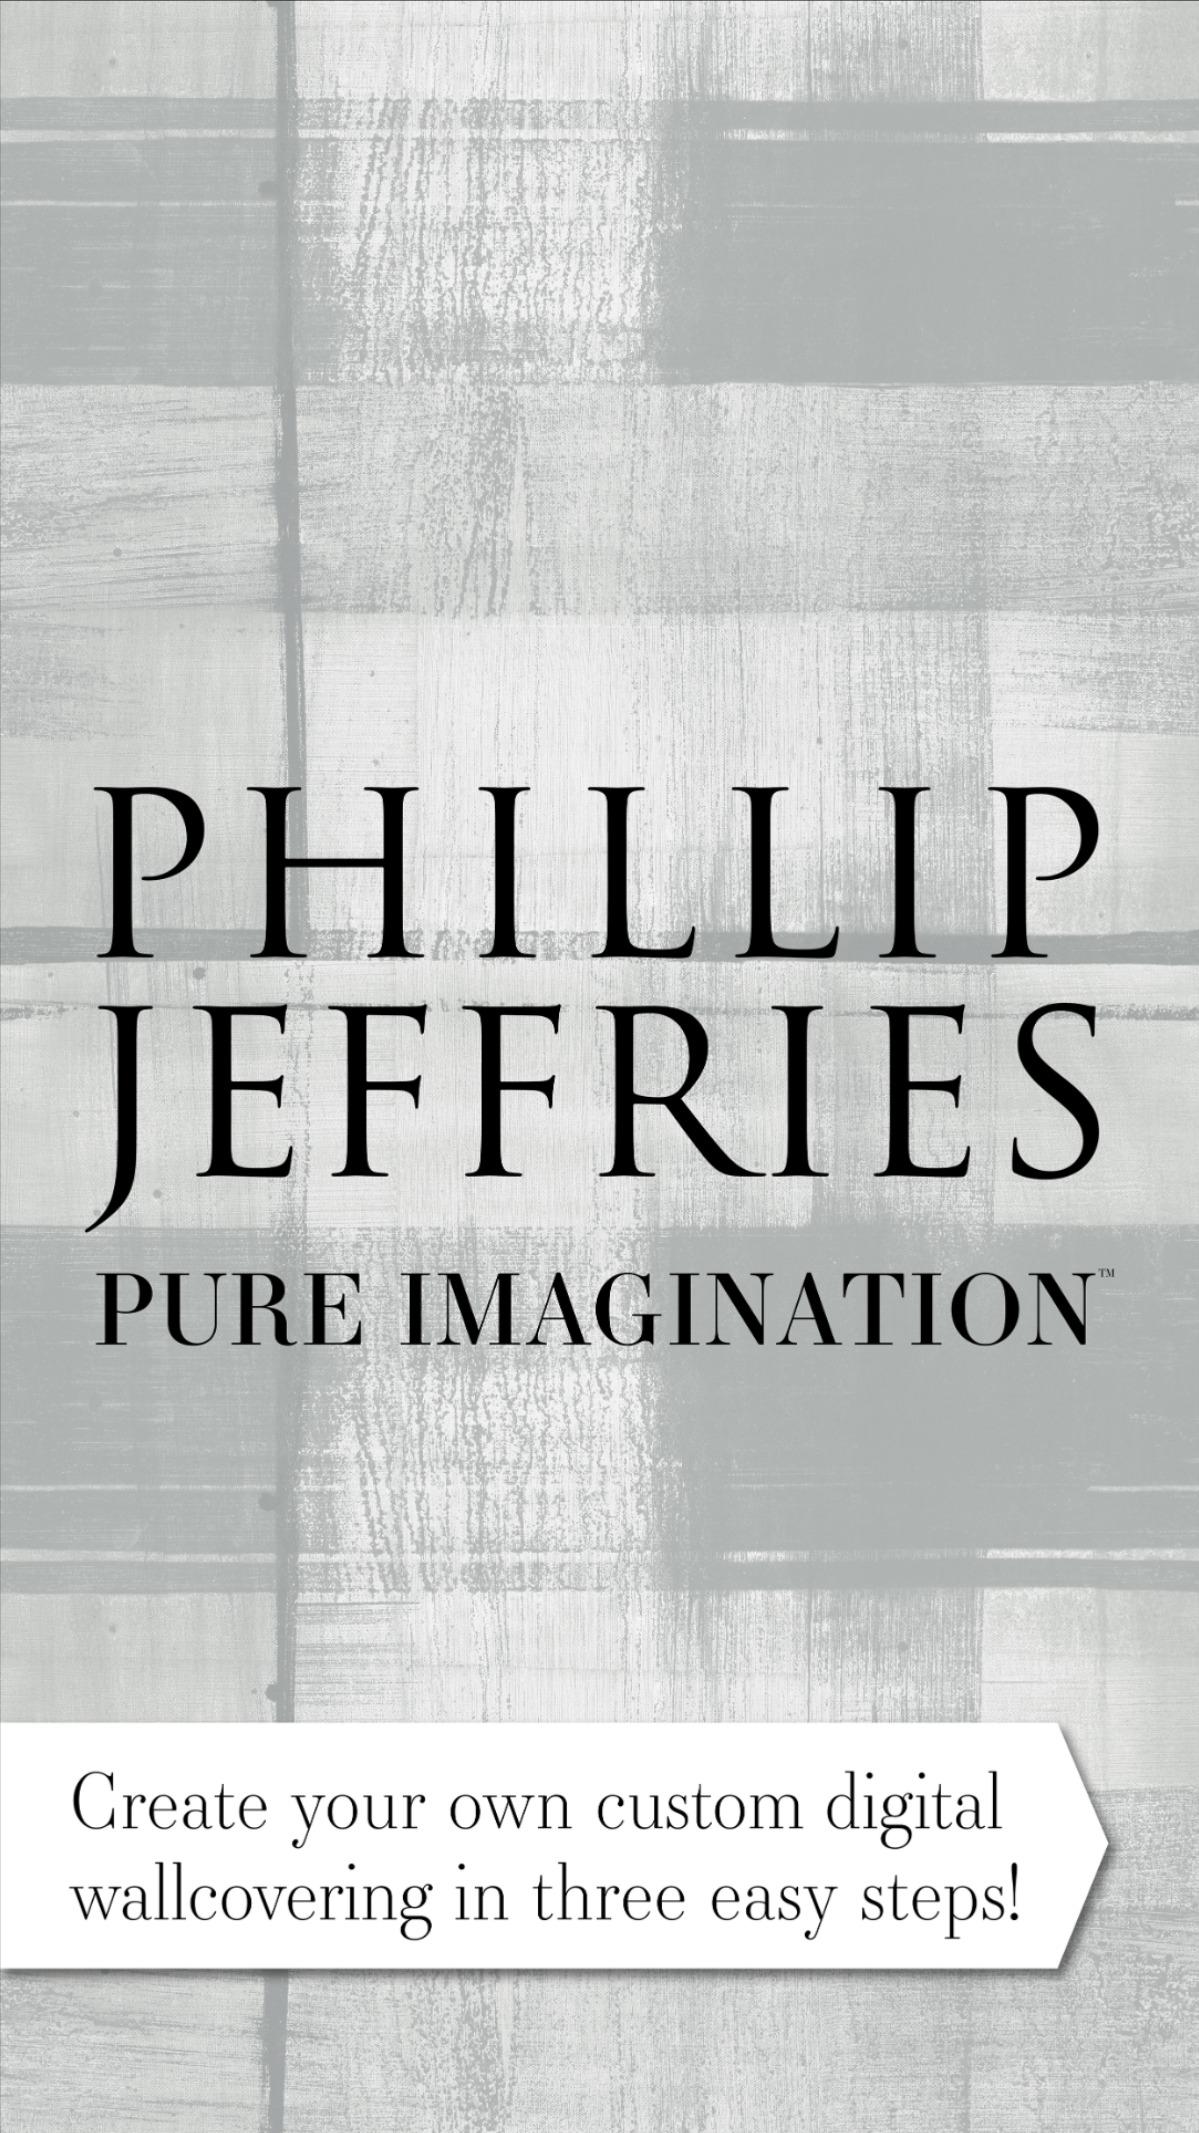 Pure Imagination ™! Design your own custom digital wallcovering.